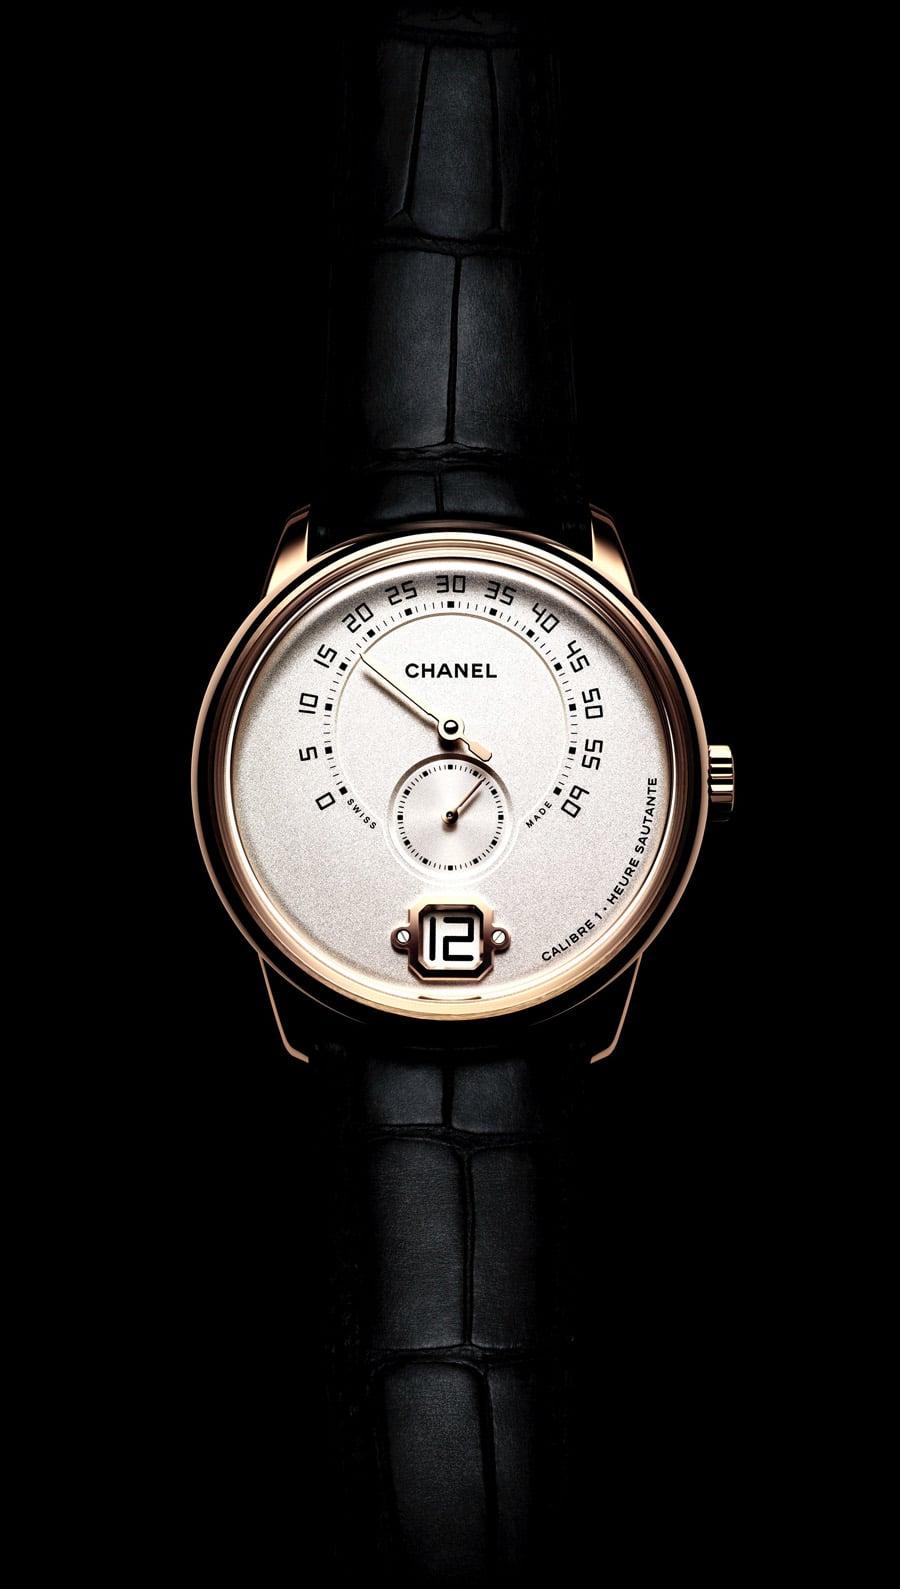 Chanel: Monsieur de Chanel